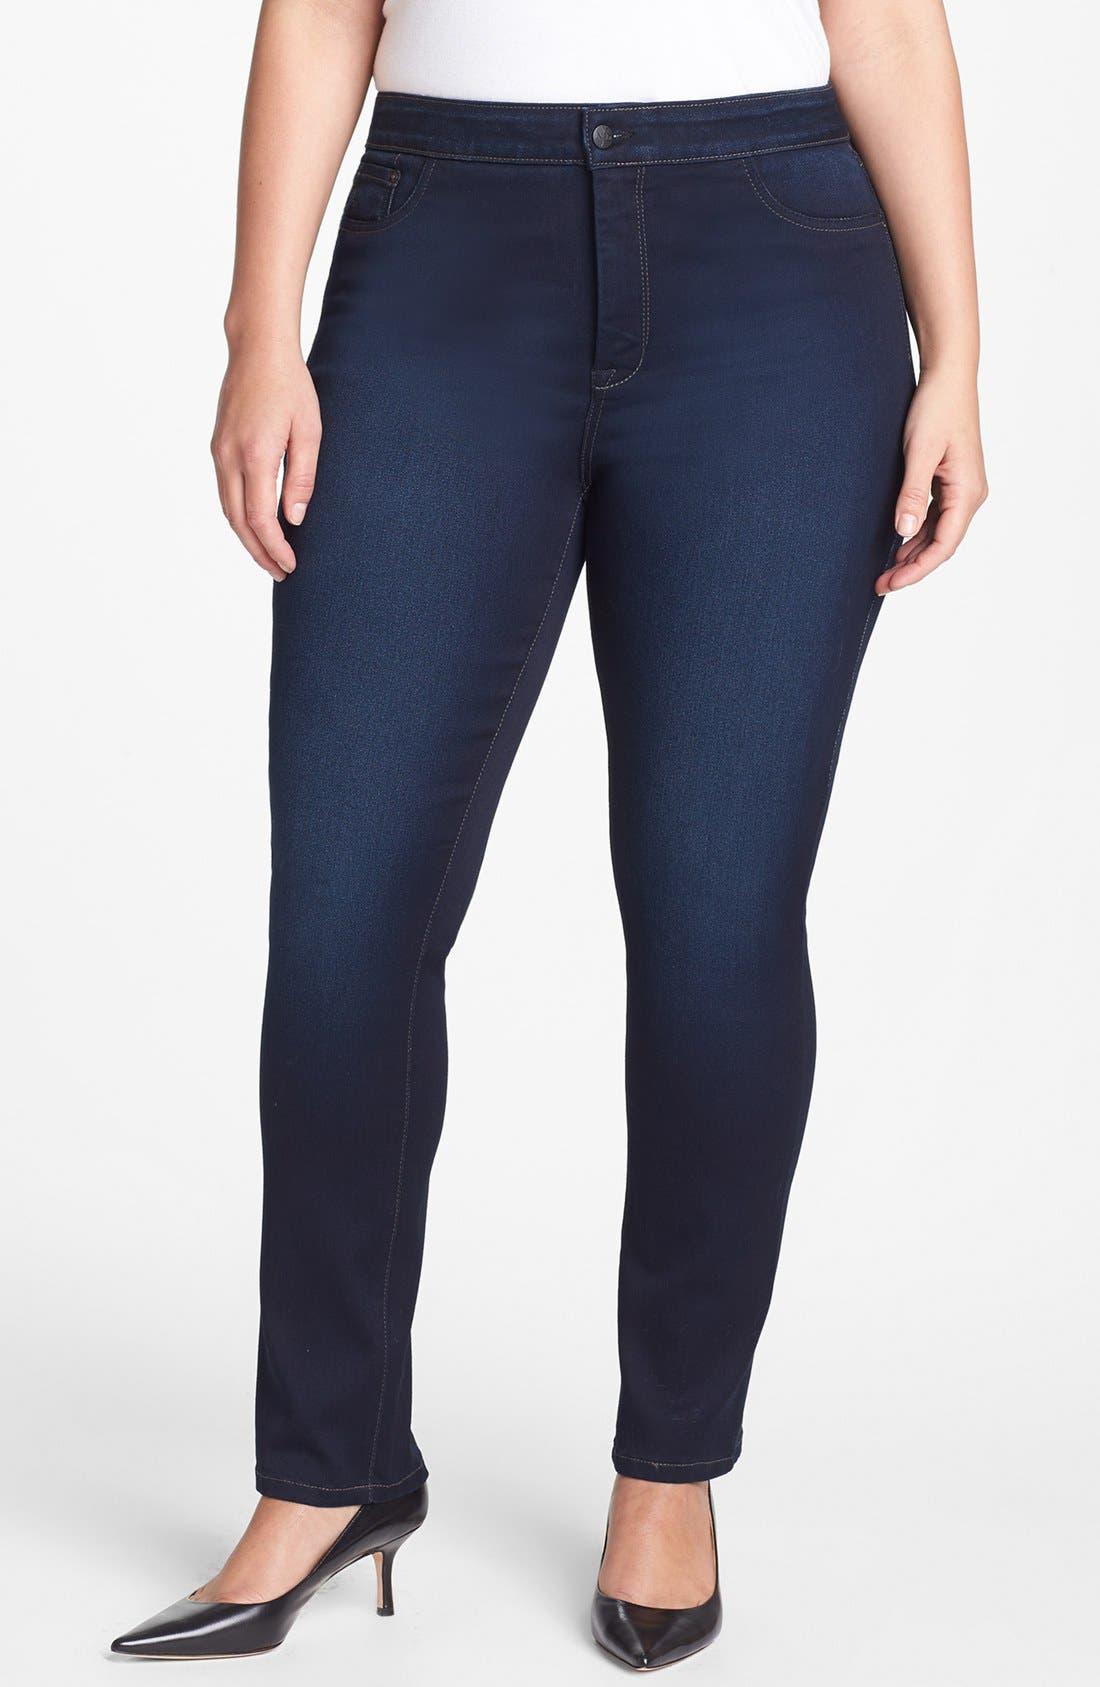 Alternate Image 1 Selected - NYDJ 'Jaclyn' Stretch Skinny Jeans (Pasadena) (Plus Size)